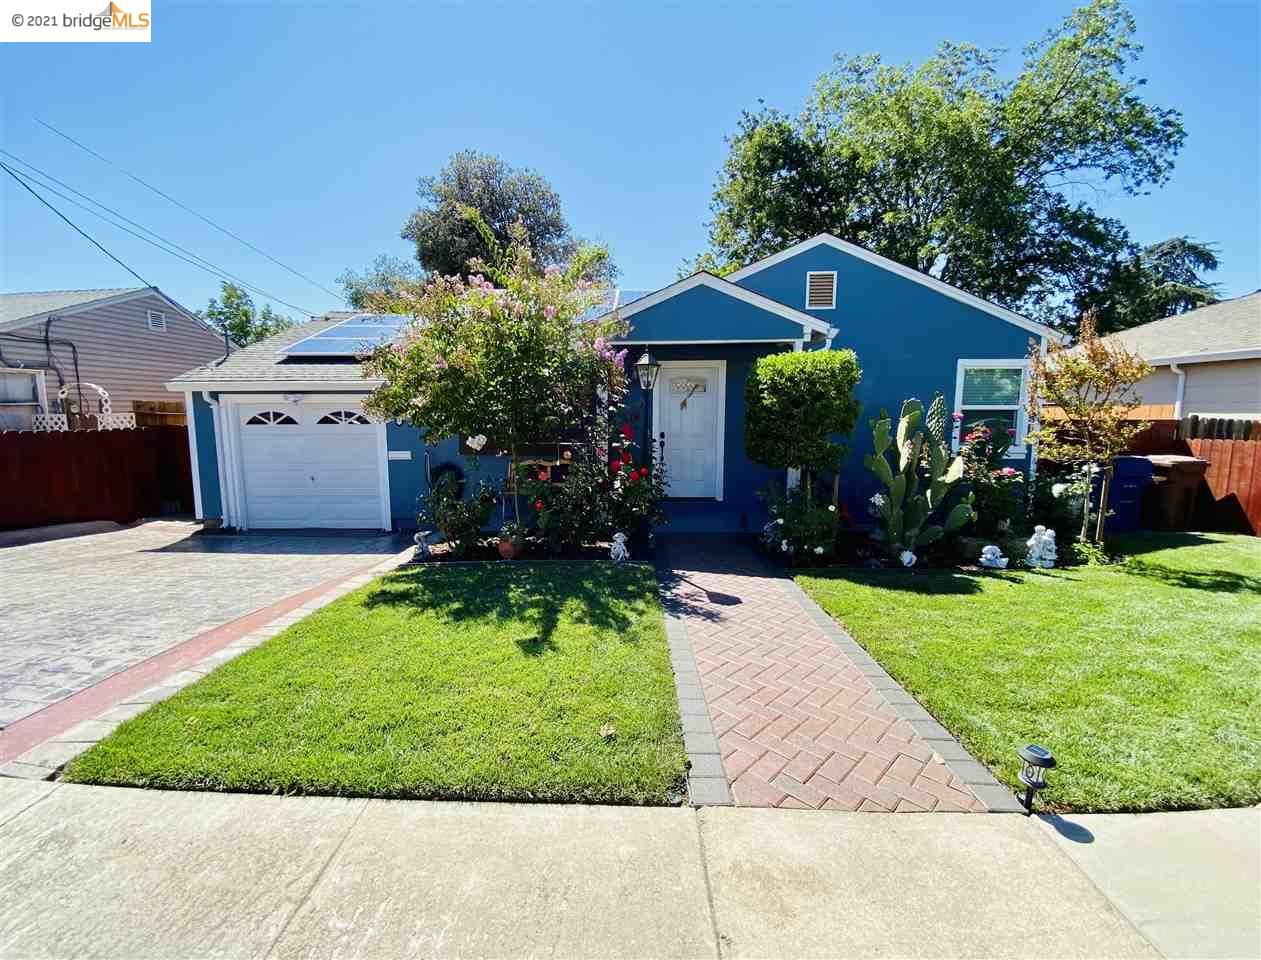 Photo of 1932 Acacia Ave, ANTIOCH, CA 94509 (MLS # 40961604)